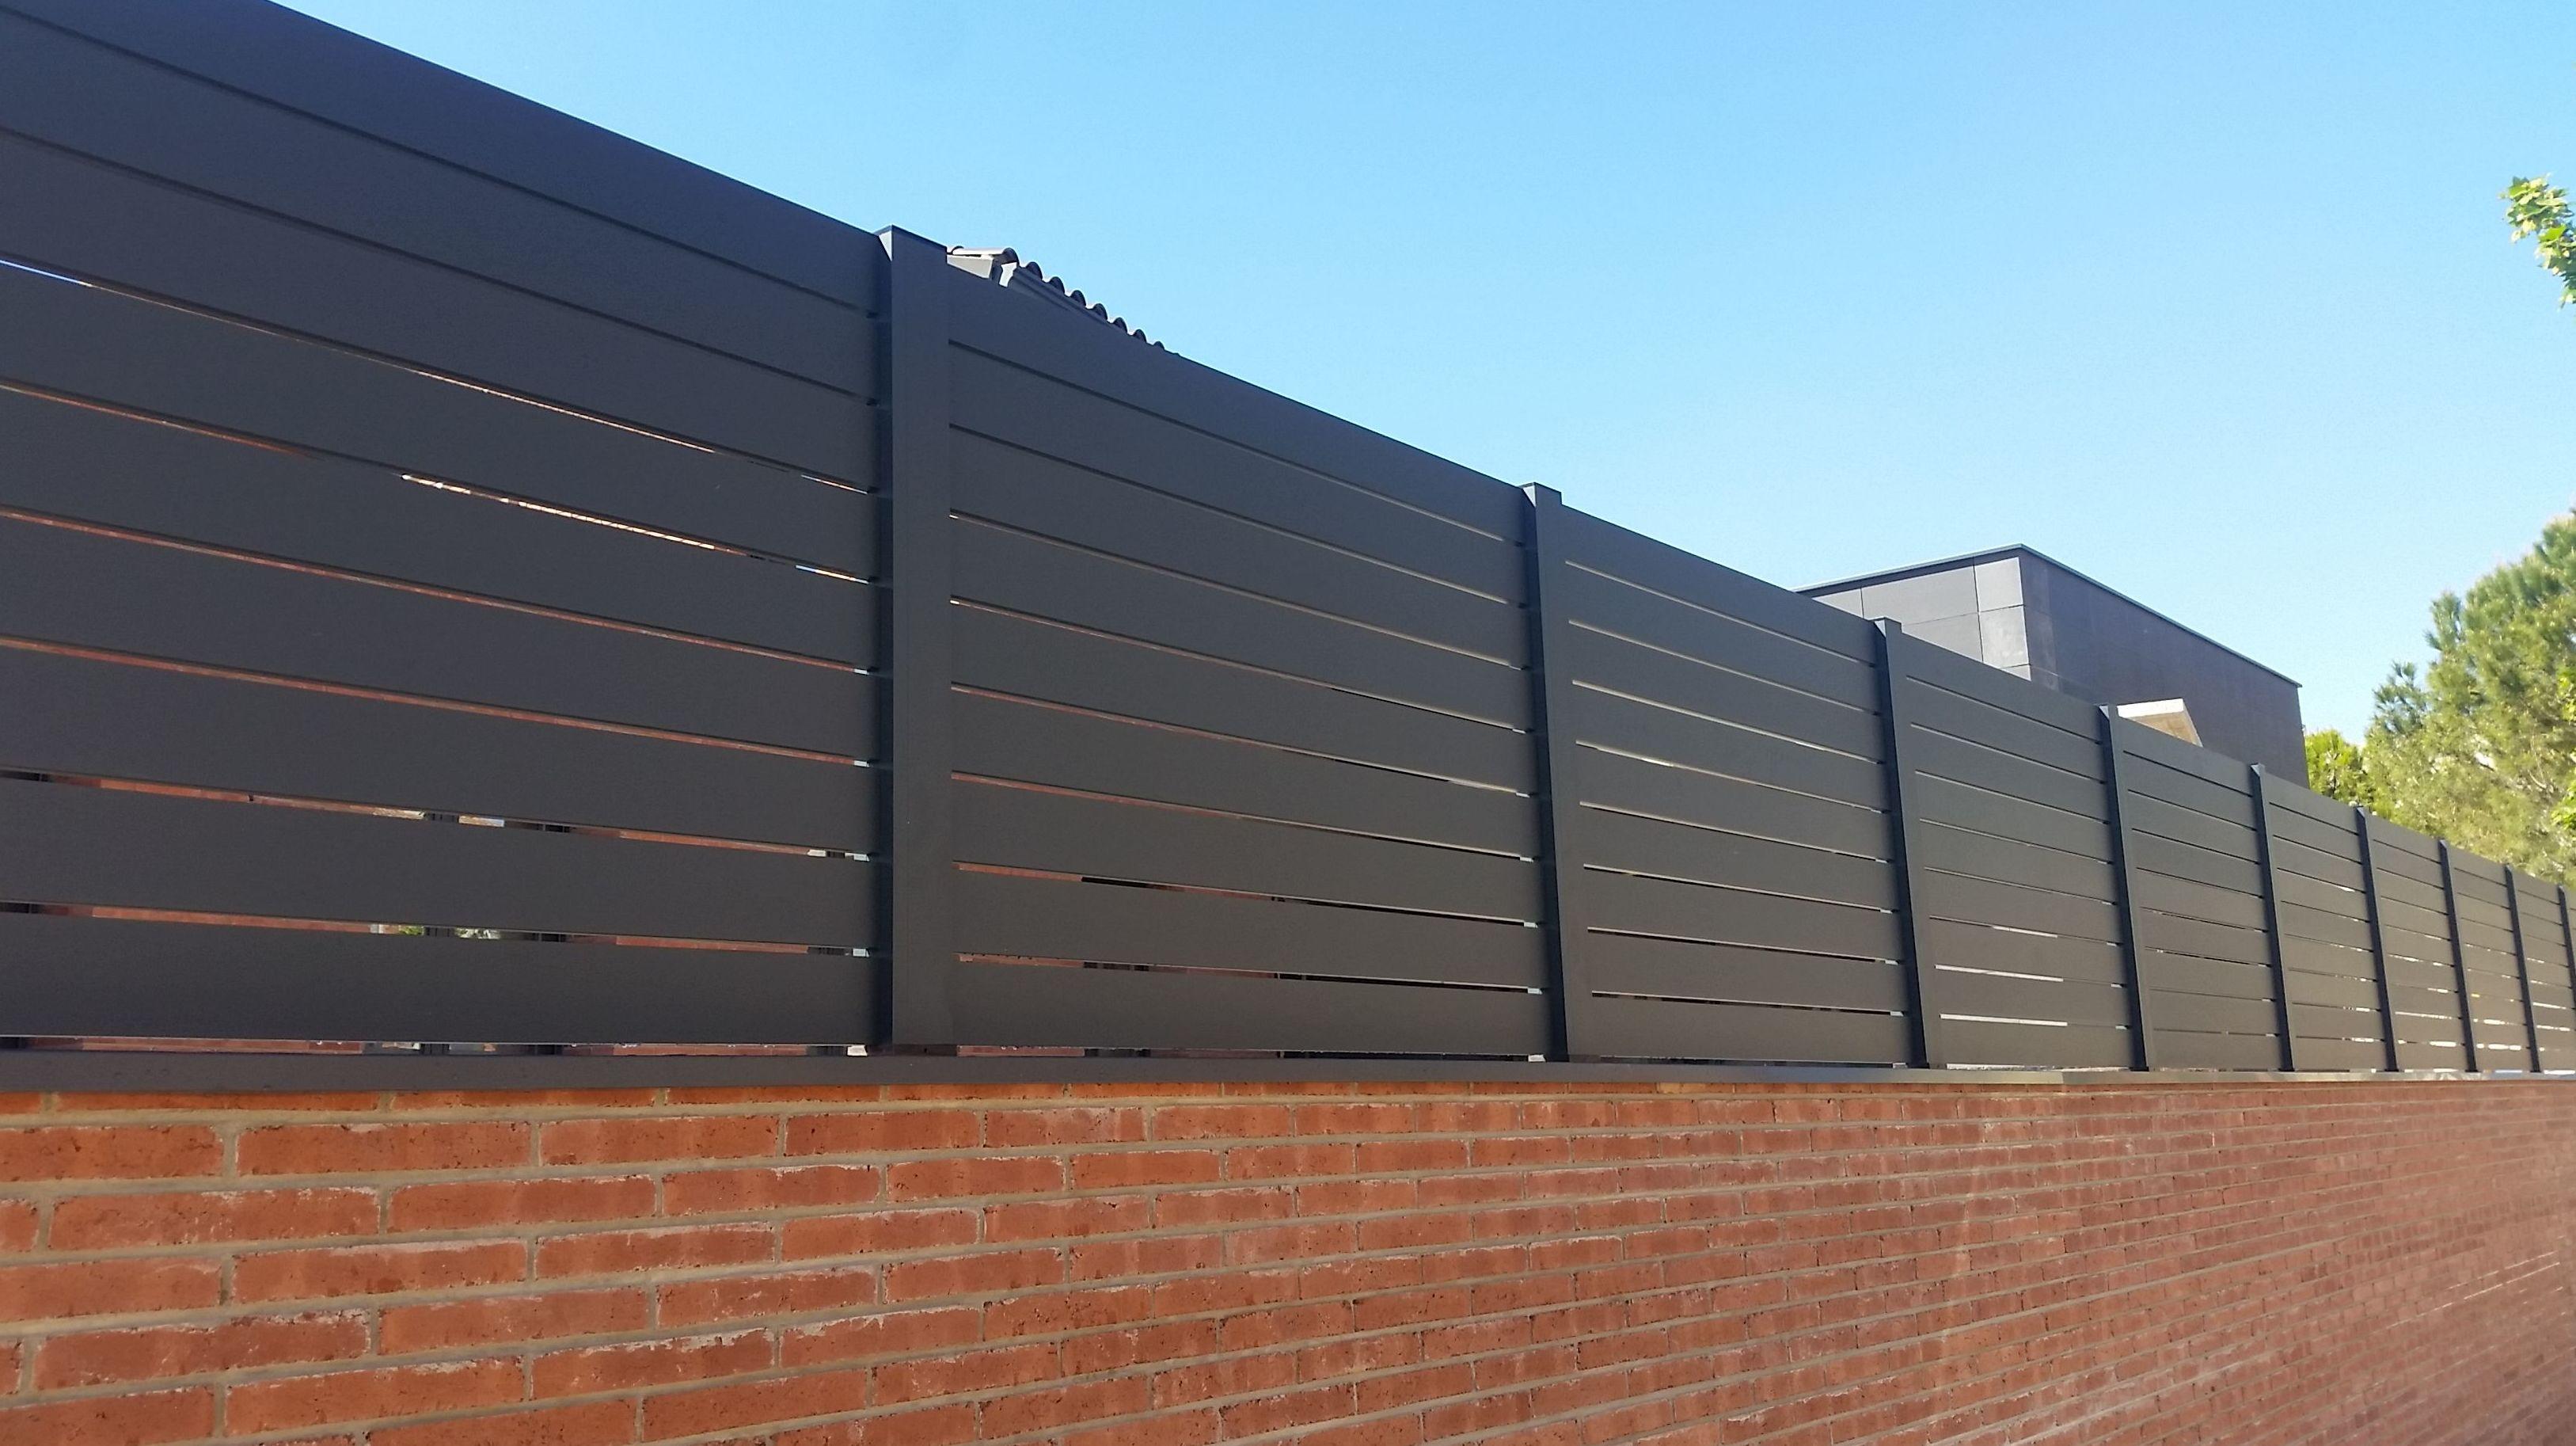 Foto 15 de Carpintería de aluminio, metálica y PVC en Calafell   Aluminis Solé